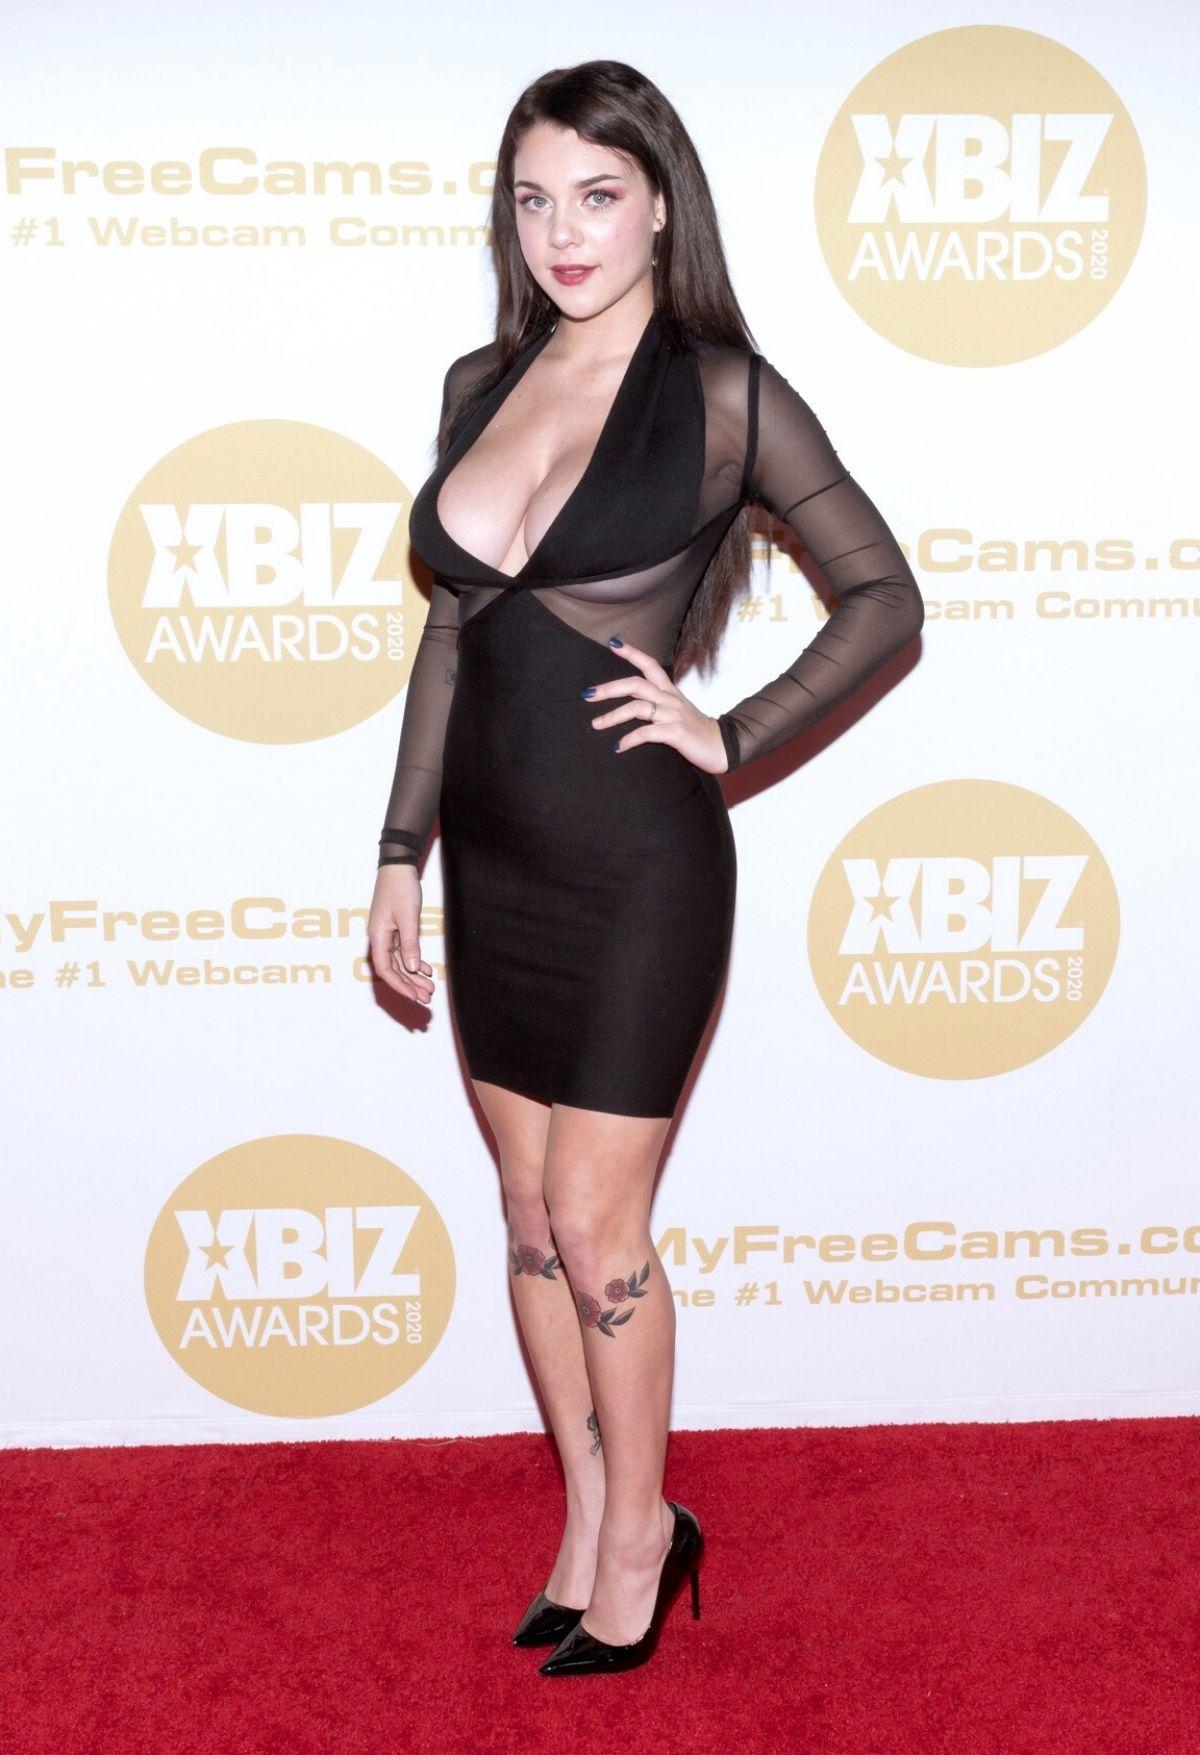 GABBIE CARTER at 2020 Xbiz Awards in Los Angeles 01/16